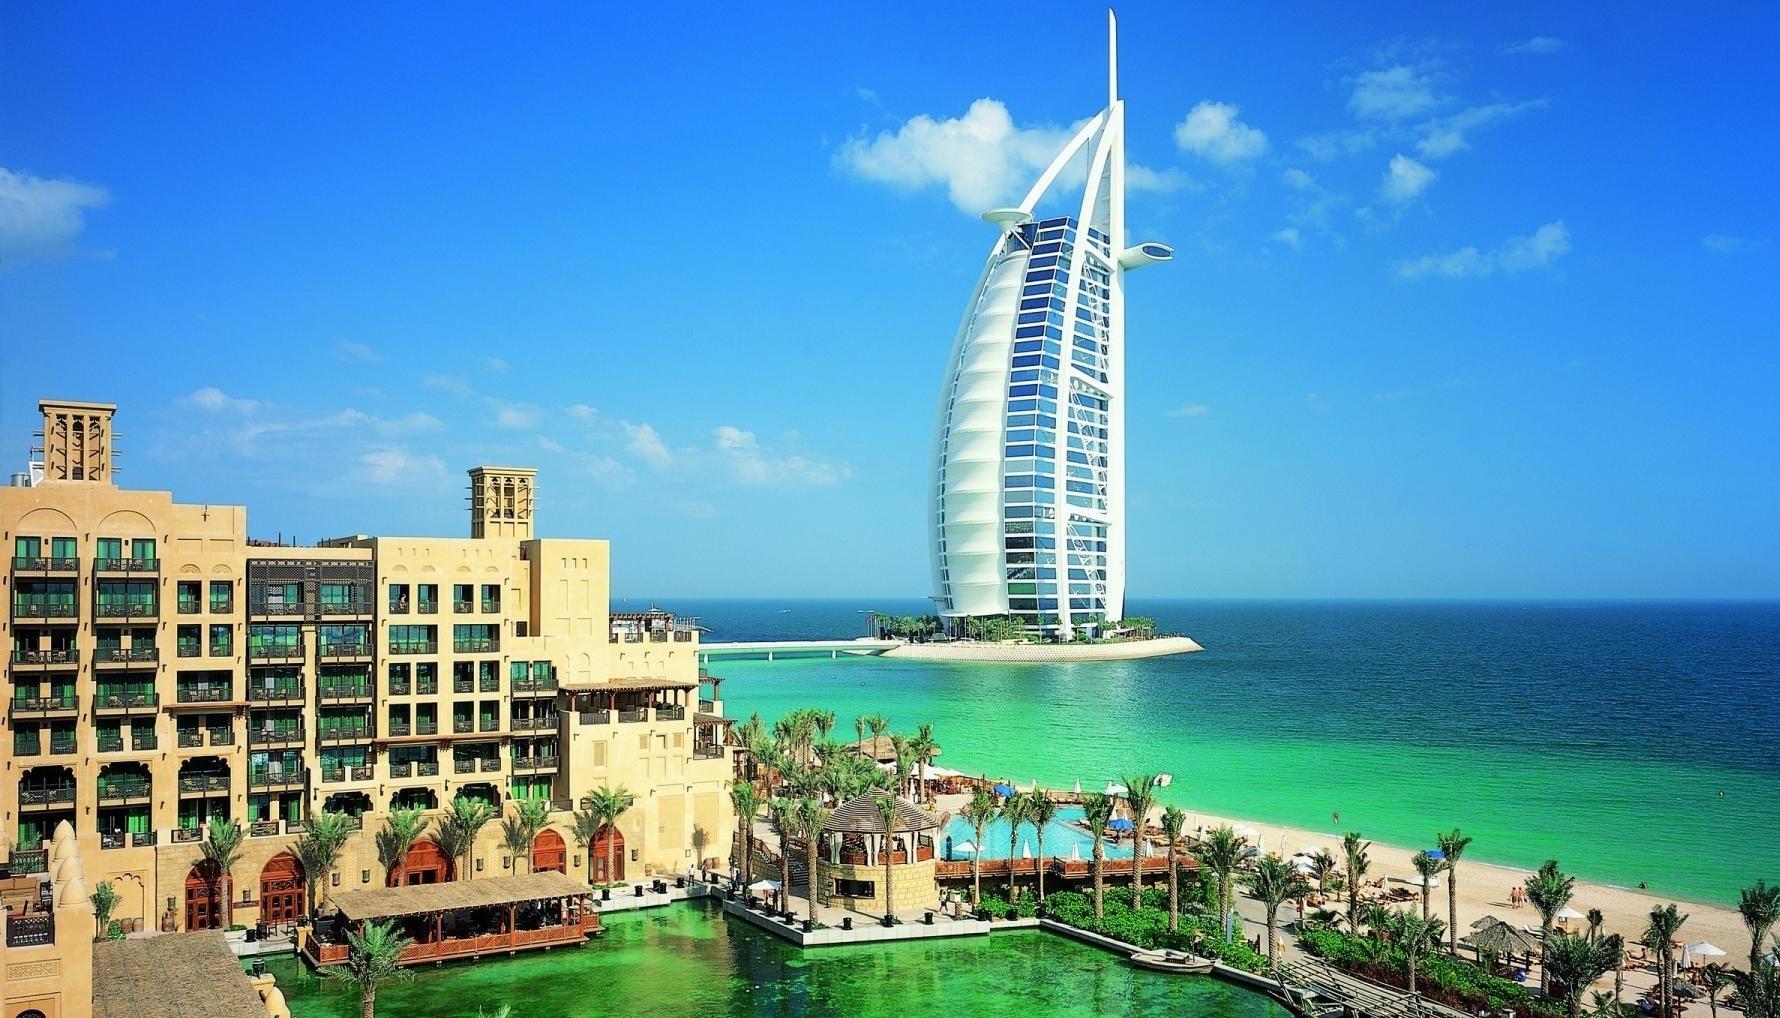 Екскурзия до Дубай - Бурдж ал-Араб - TravelCard.BG